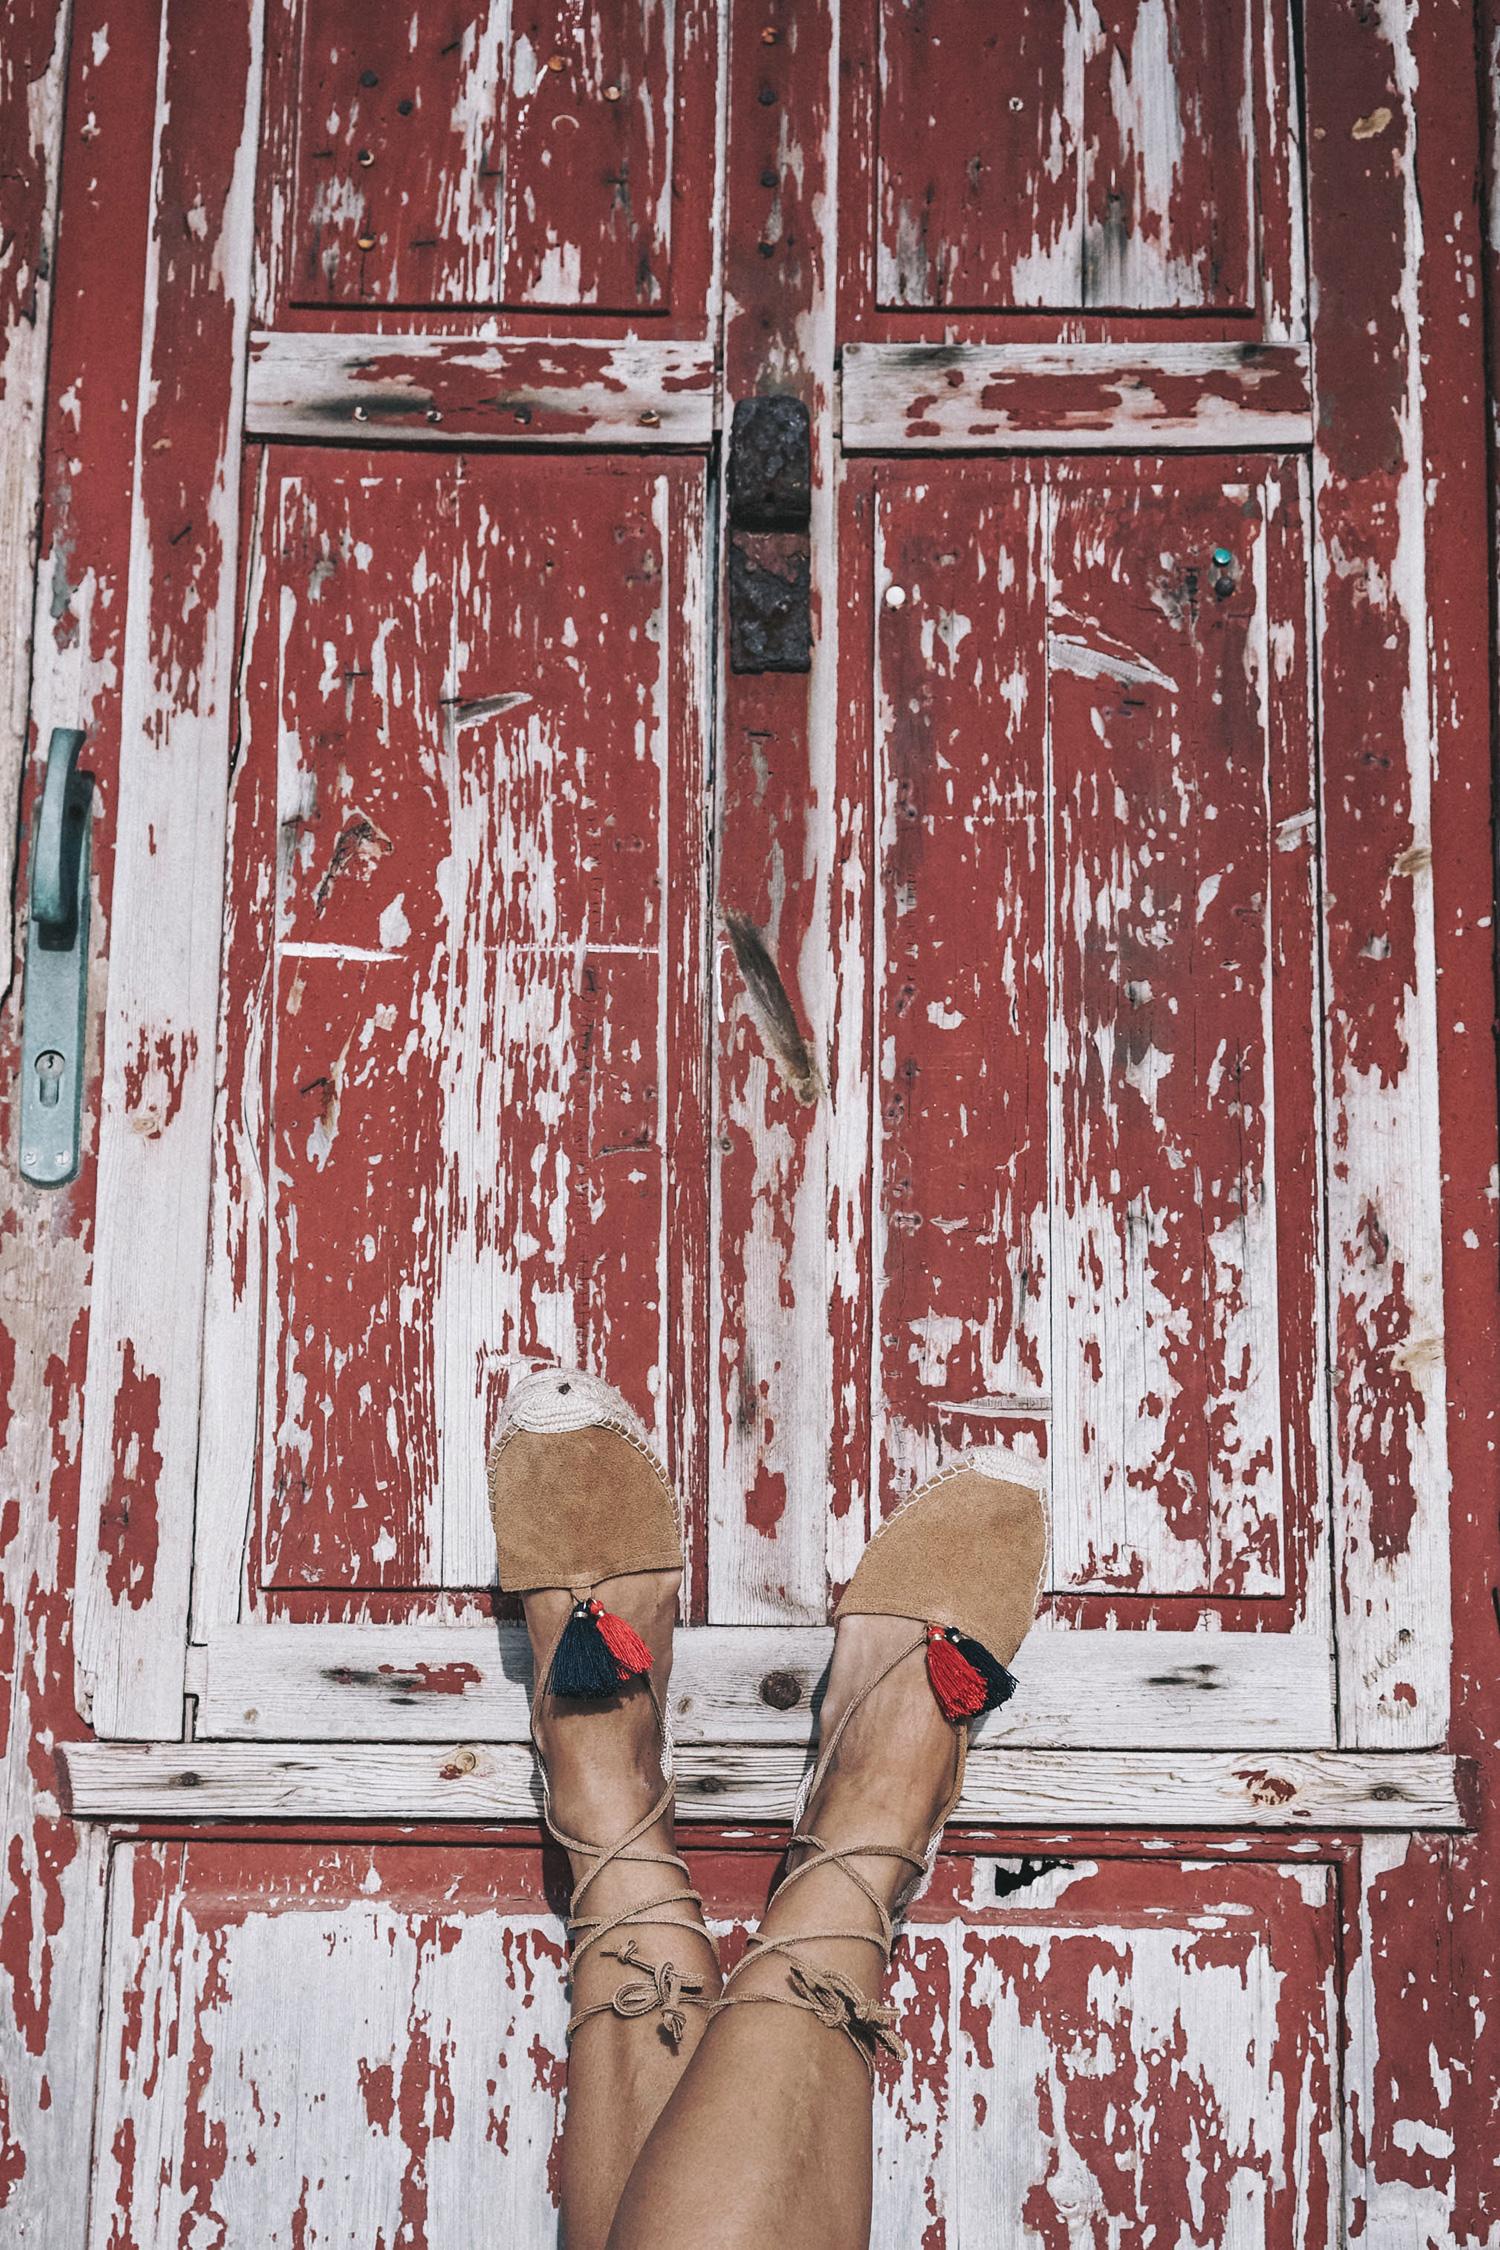 Lace_up_Blouse-Ralph_Lauren-Soludos_Espadrilles-Soludos_Escapes-Skirt-Straw_Hat-Canotier-Lack_Of_Color-Street_Style-Mykonos-Greece-Collage_Vintage-171